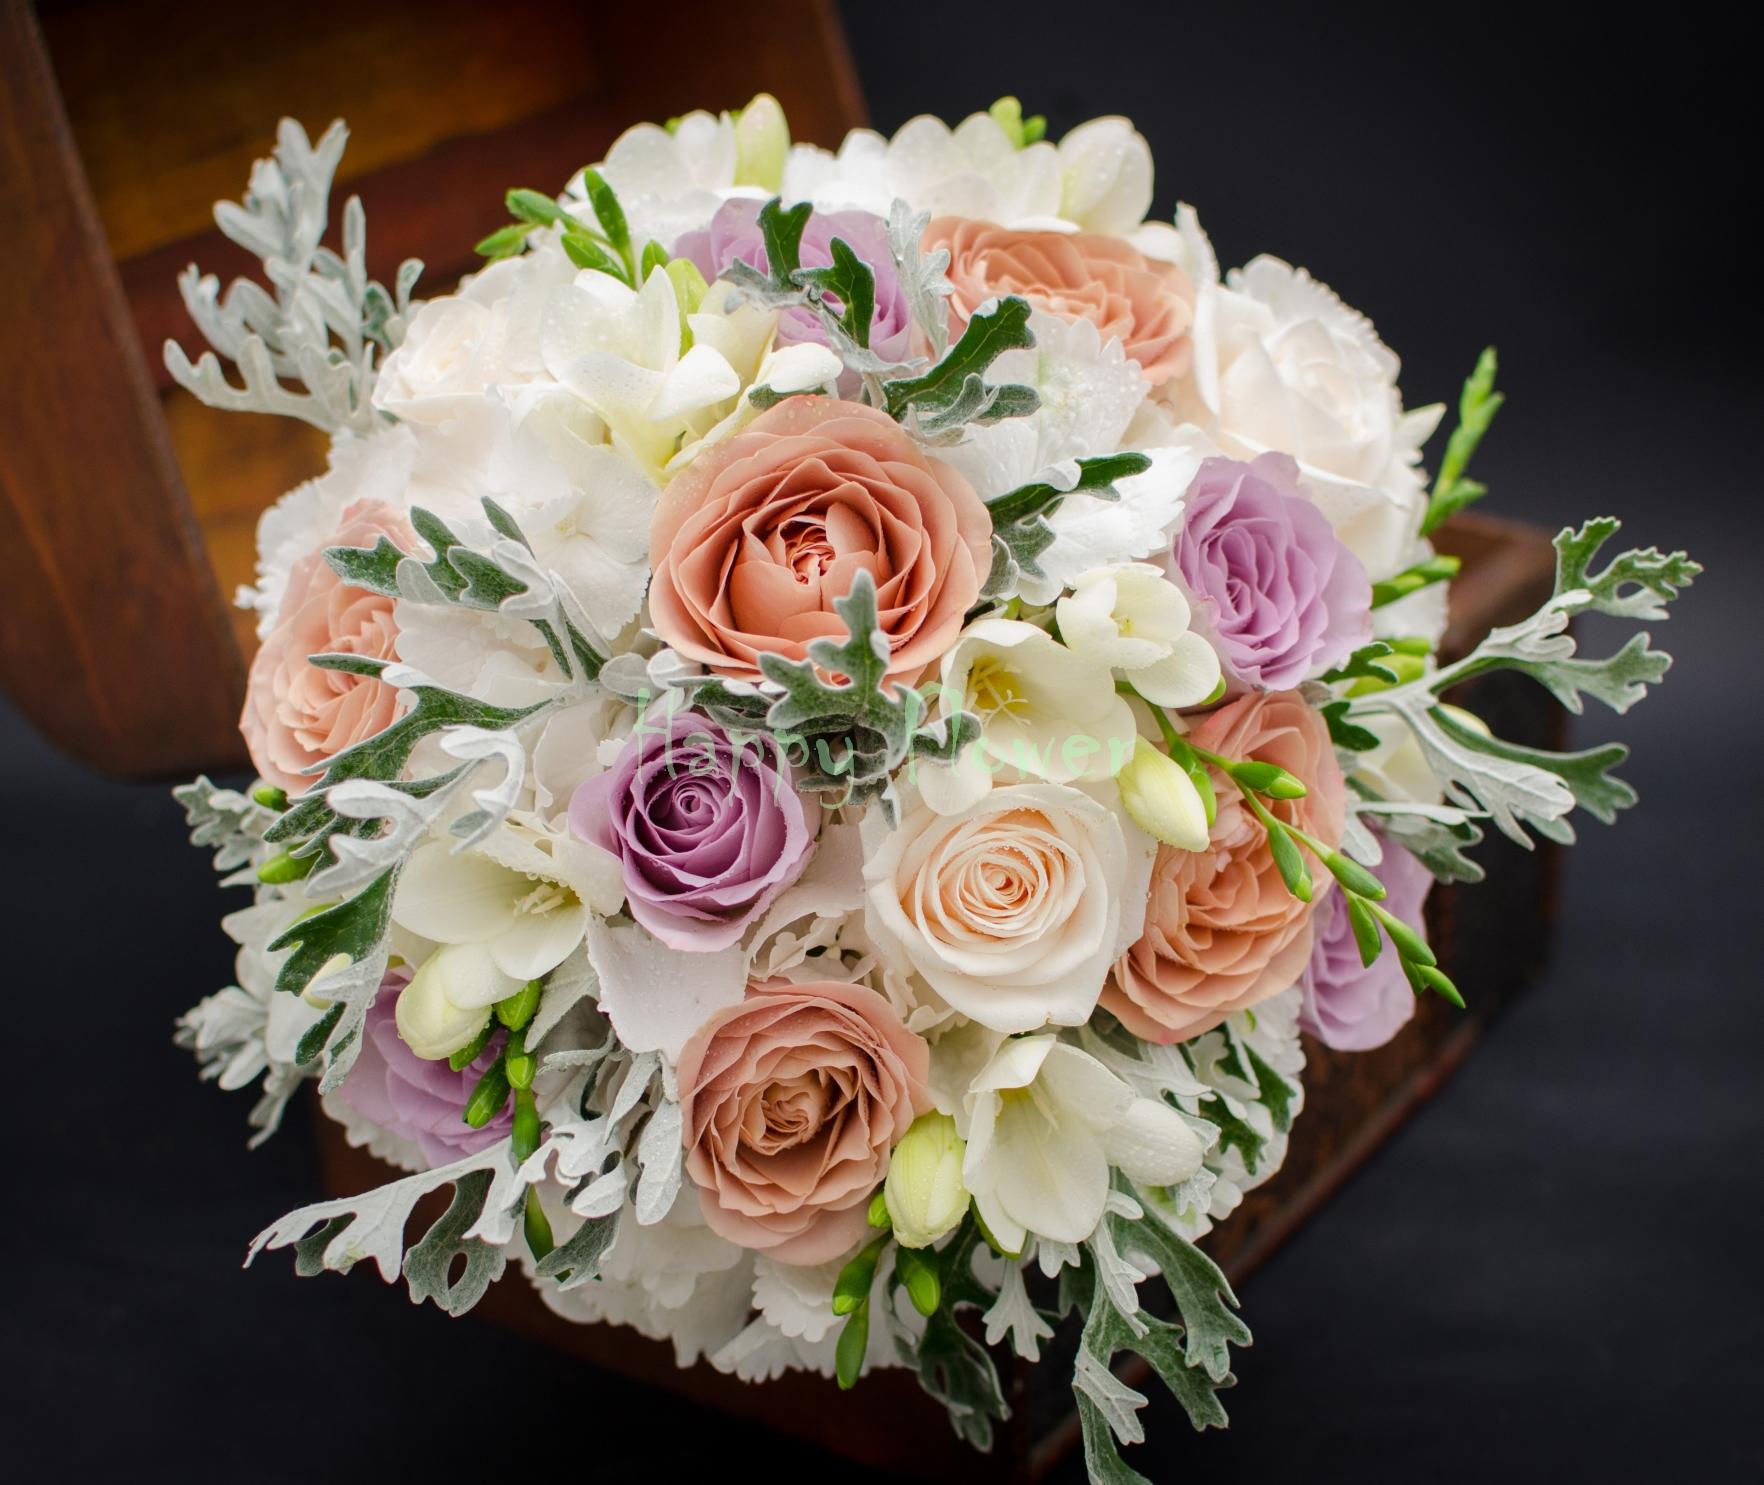 Buchet mireasa cu trandafiri Capuccino, hortensii albe, trandafiri crem, lila, frezii albe